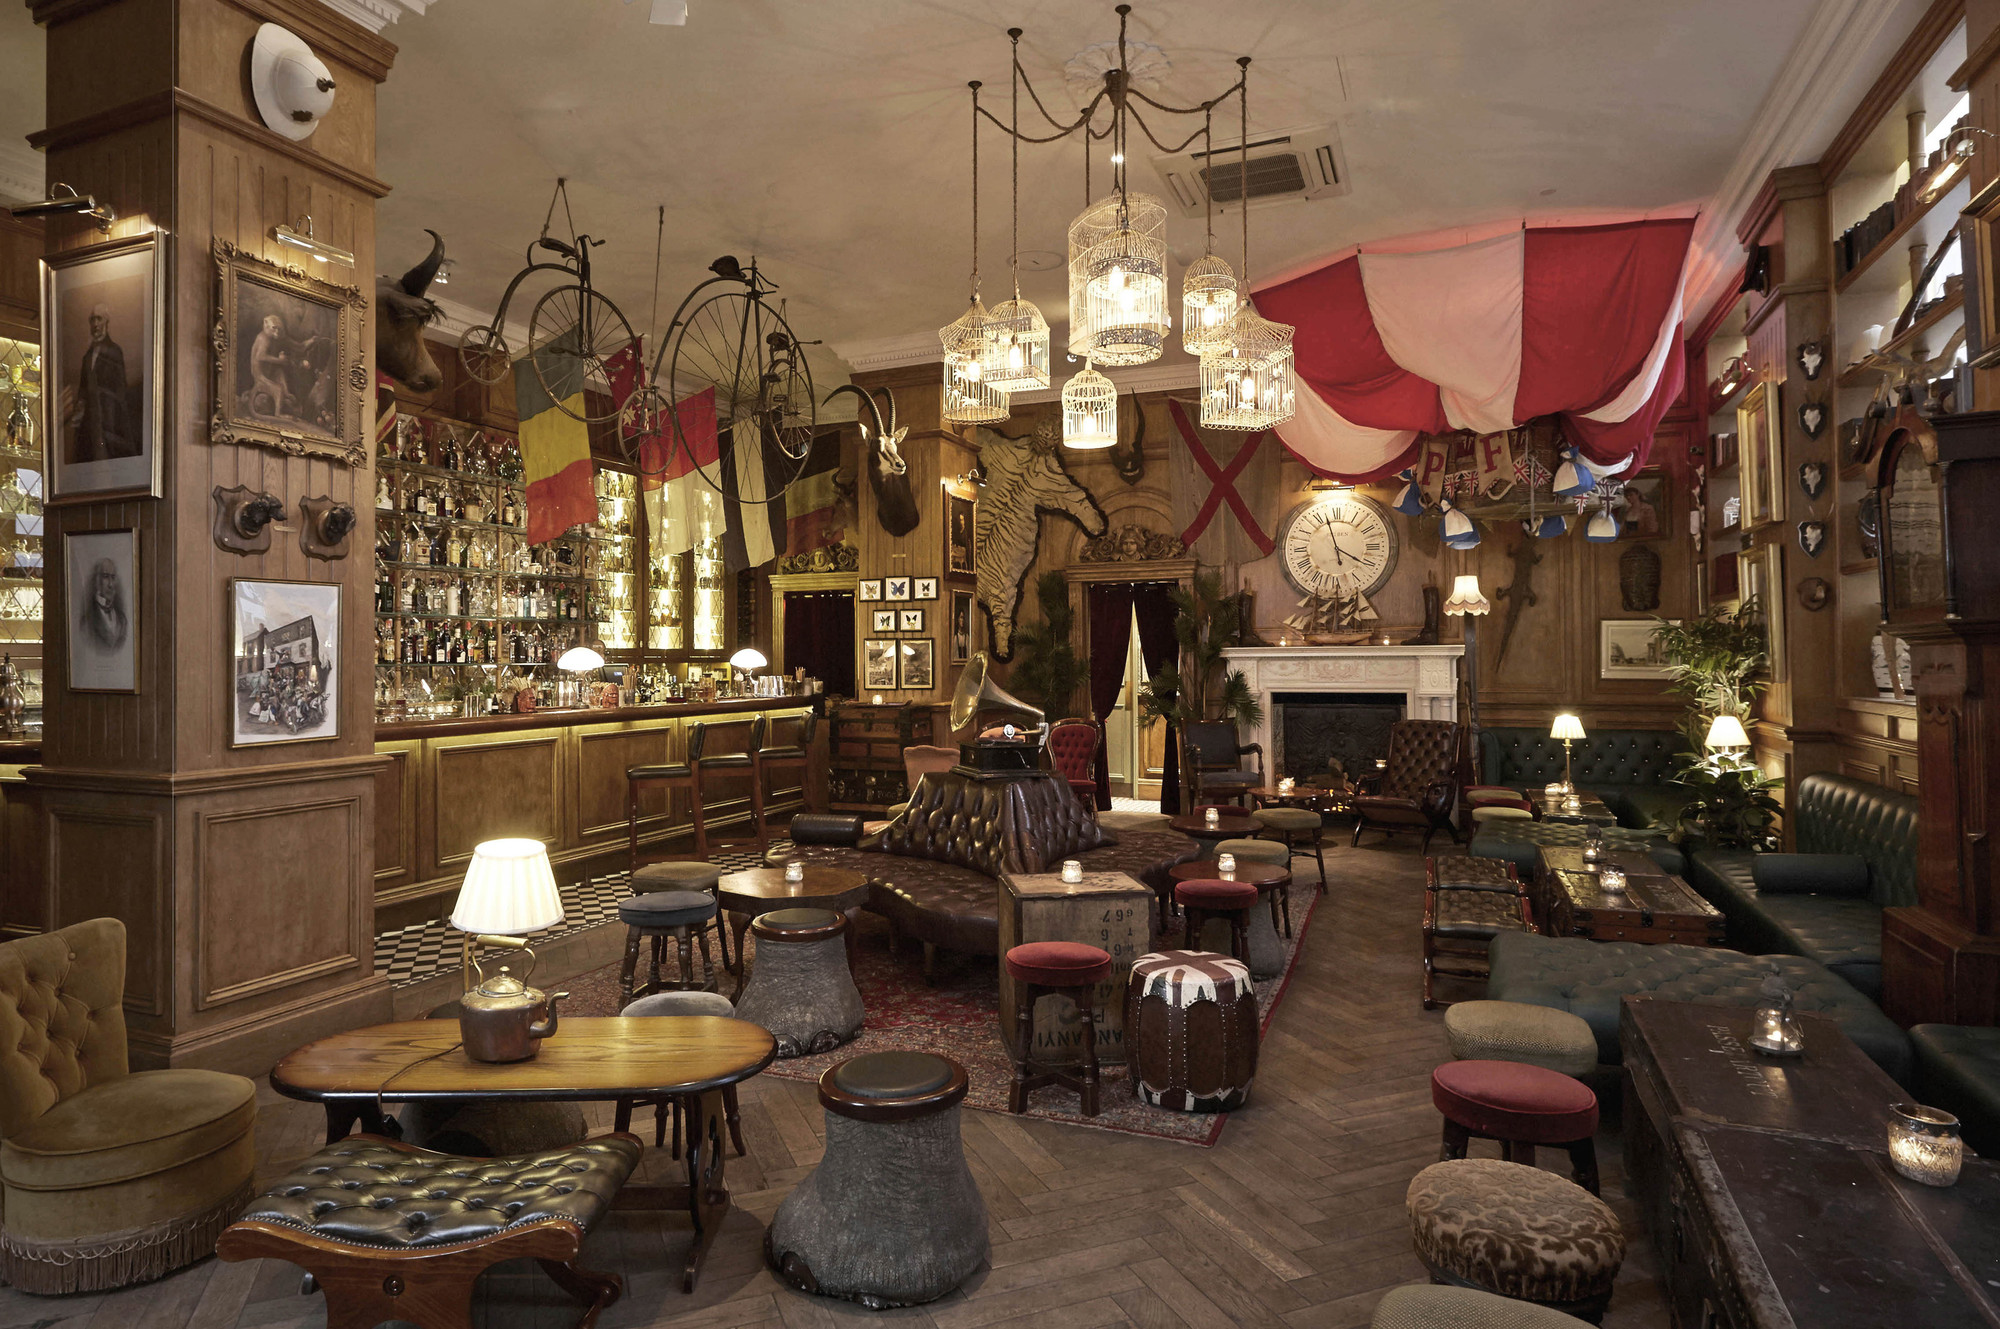 2014 Restaurant Bar Design Award WinnersStandalone Club Mr Foggs